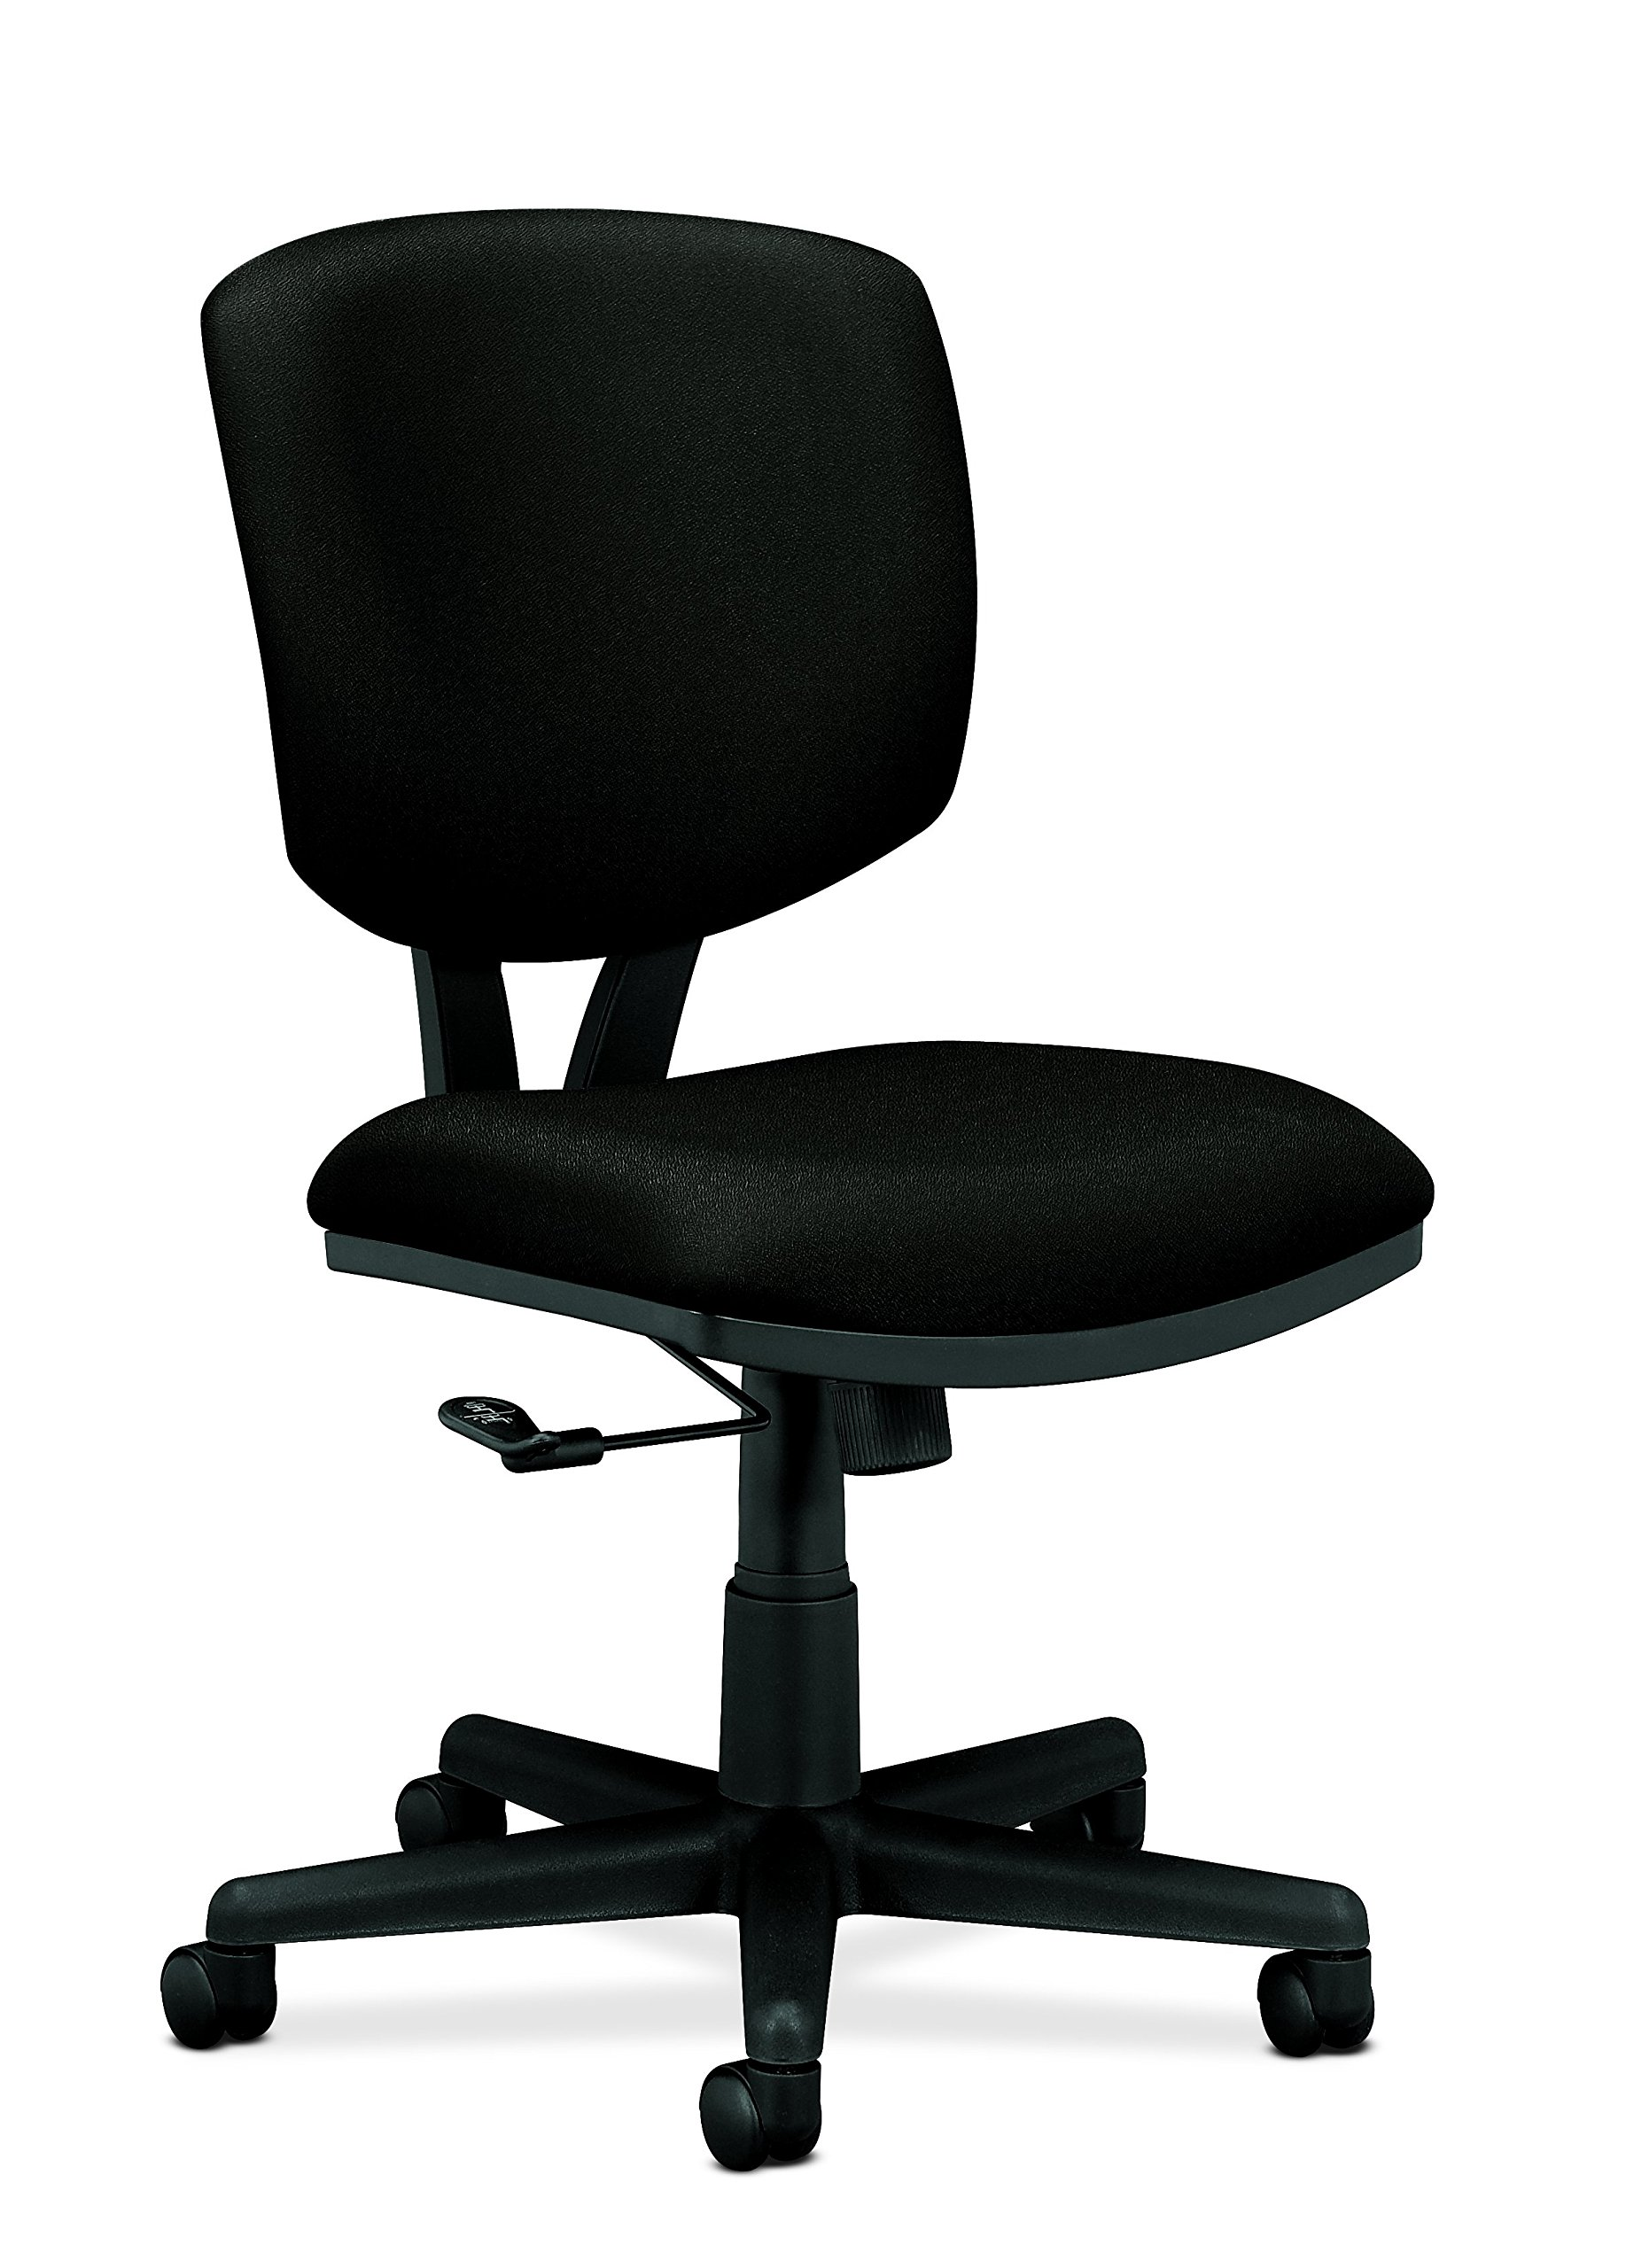 HON Volt Task Chair - Computer Chair for Office Desk, Black (H5701)